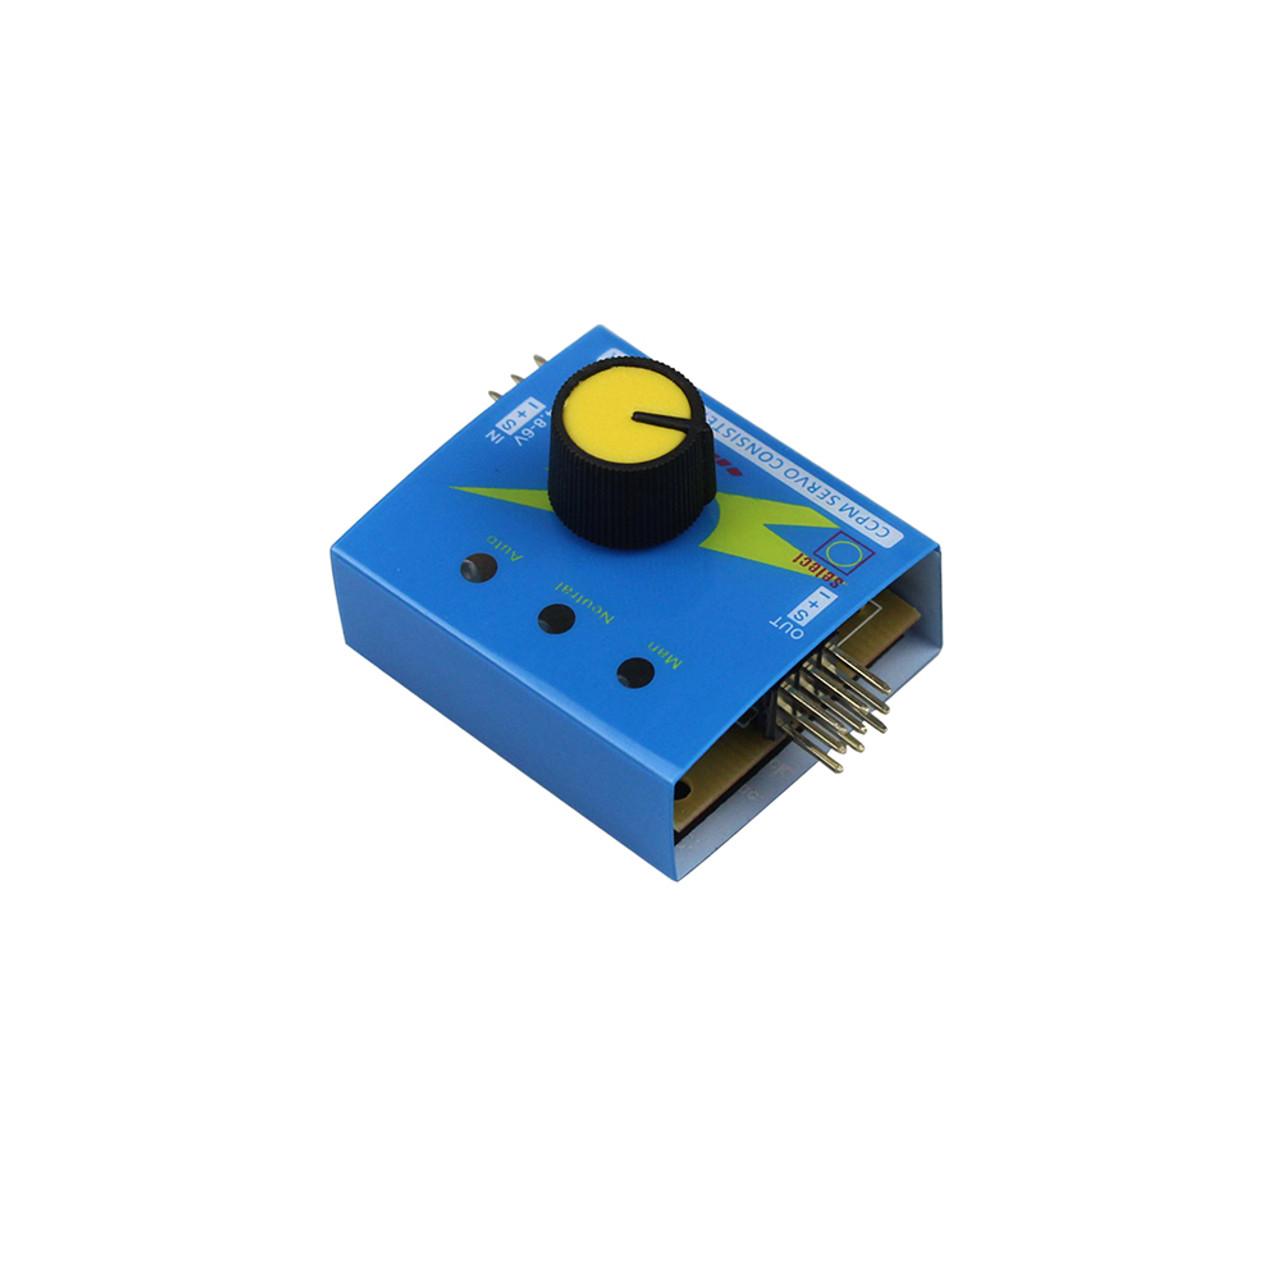 Servo Tester Gear Test CCPM Consistency Master Checker 3CH 4.8-6V ...